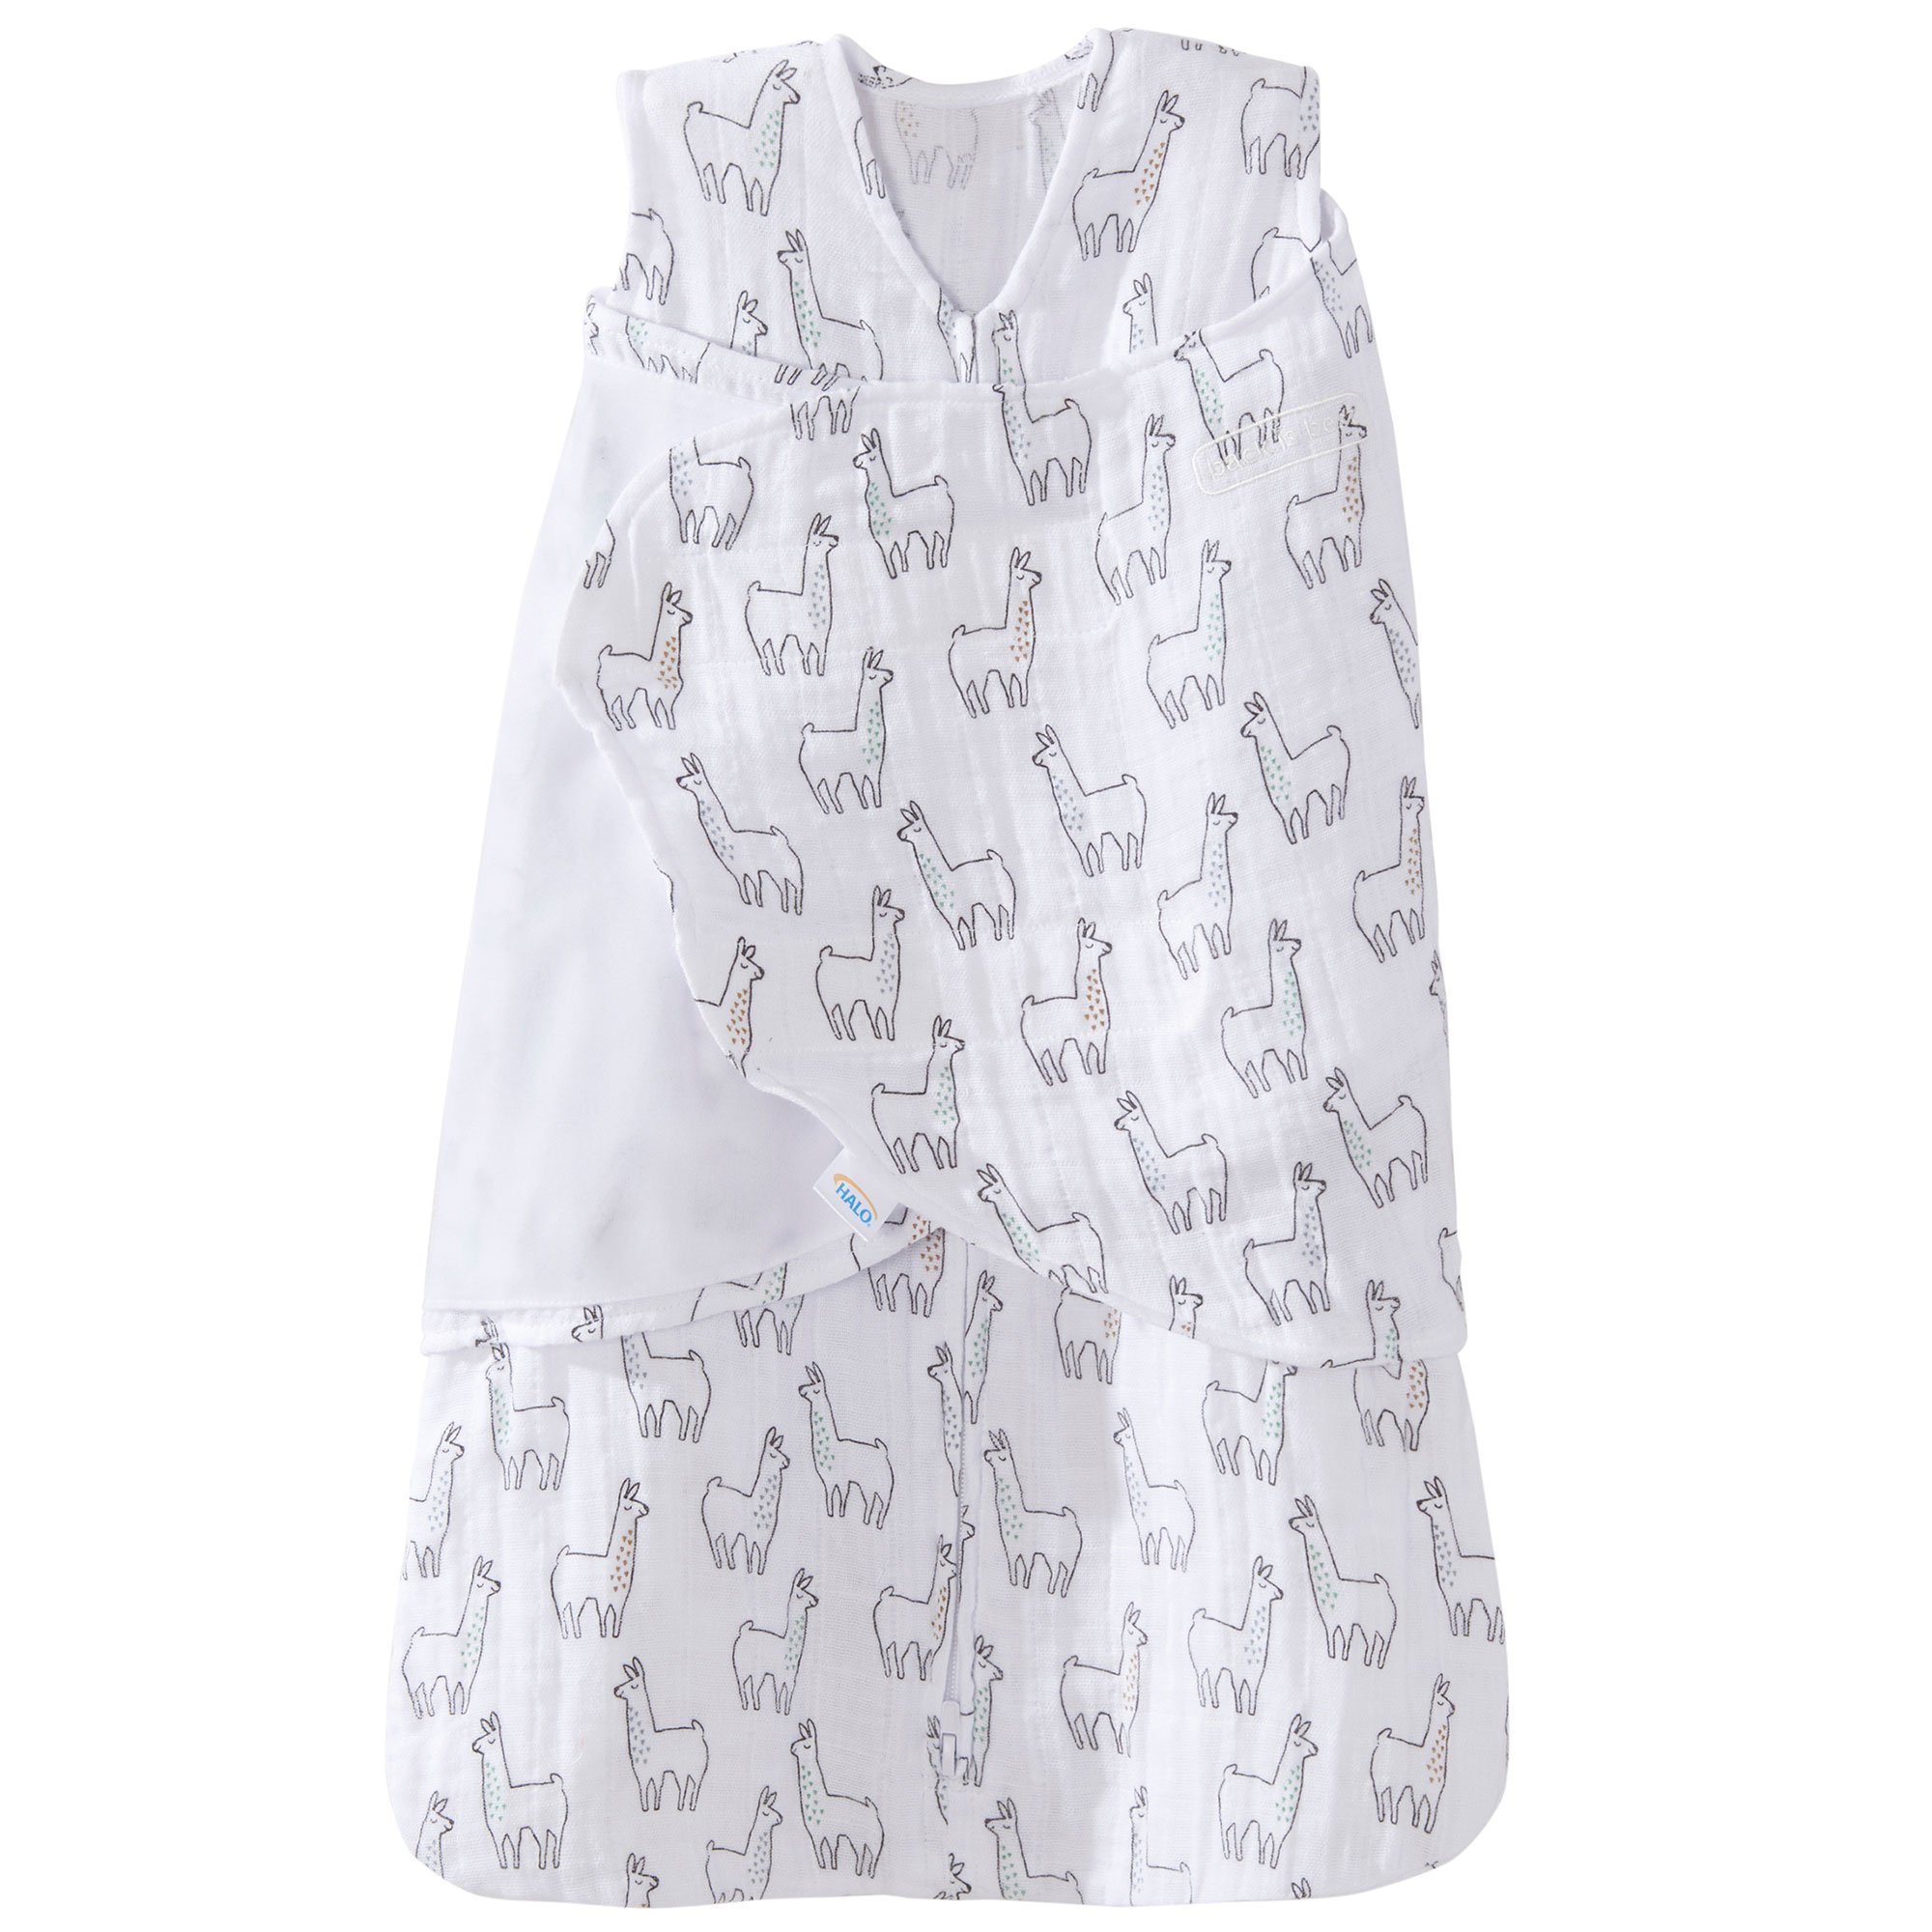 Newborn Size NB Halo Innovations HALO SleepSack Swaddle/ Cotton Lamb Scribble White